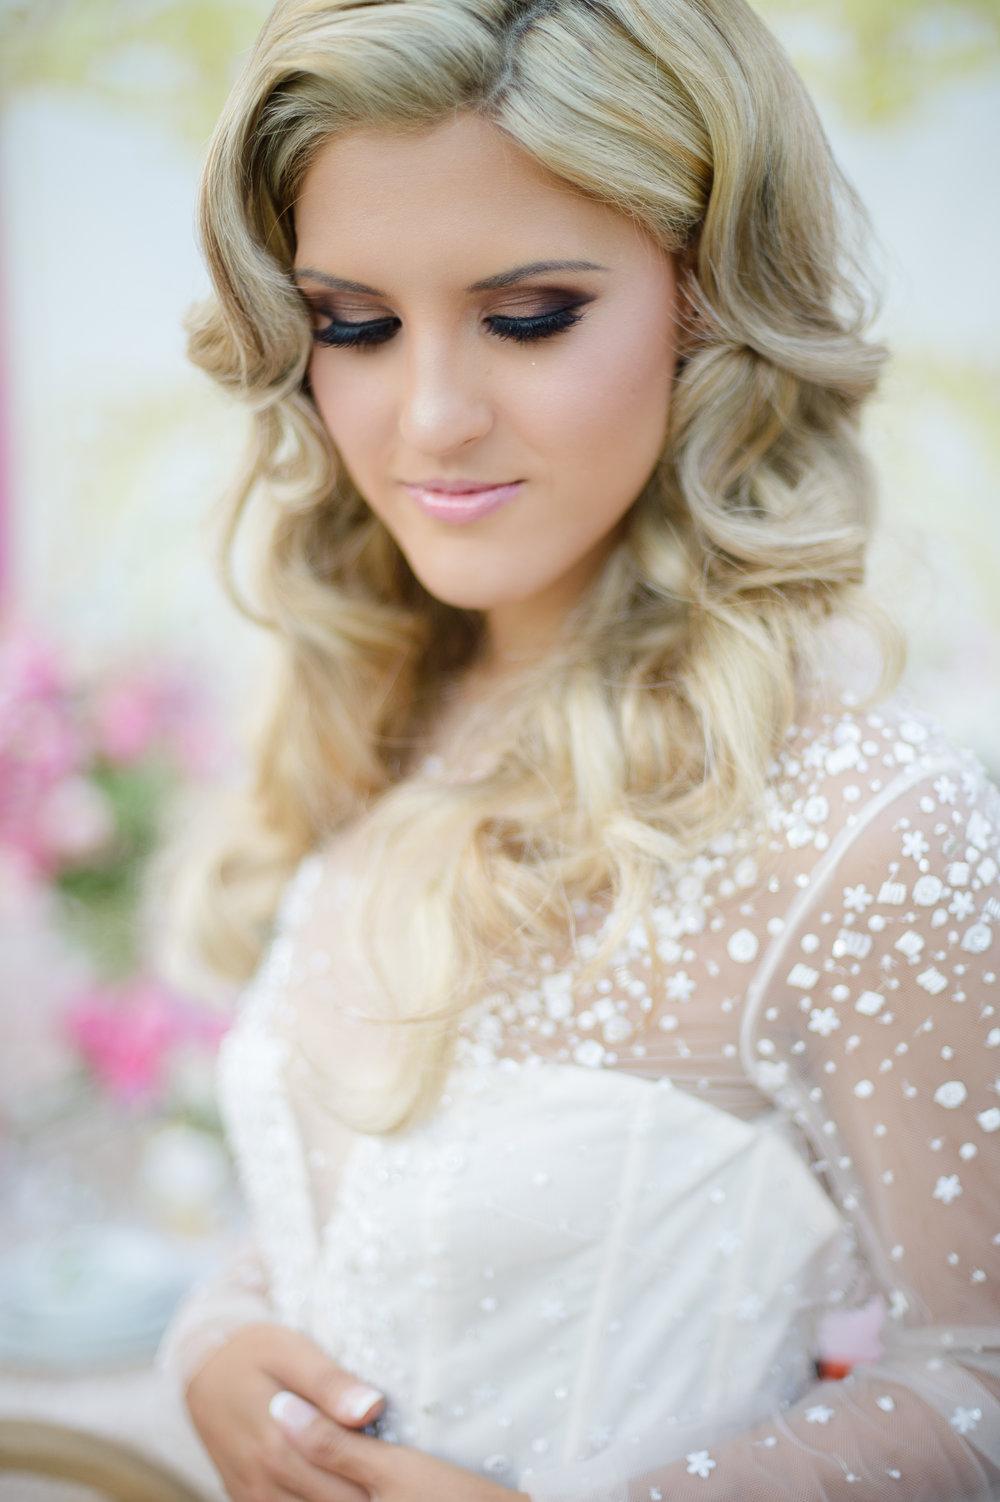 makeup-worx-mobile-wedding- makeup-hair-GTA-3.jpg